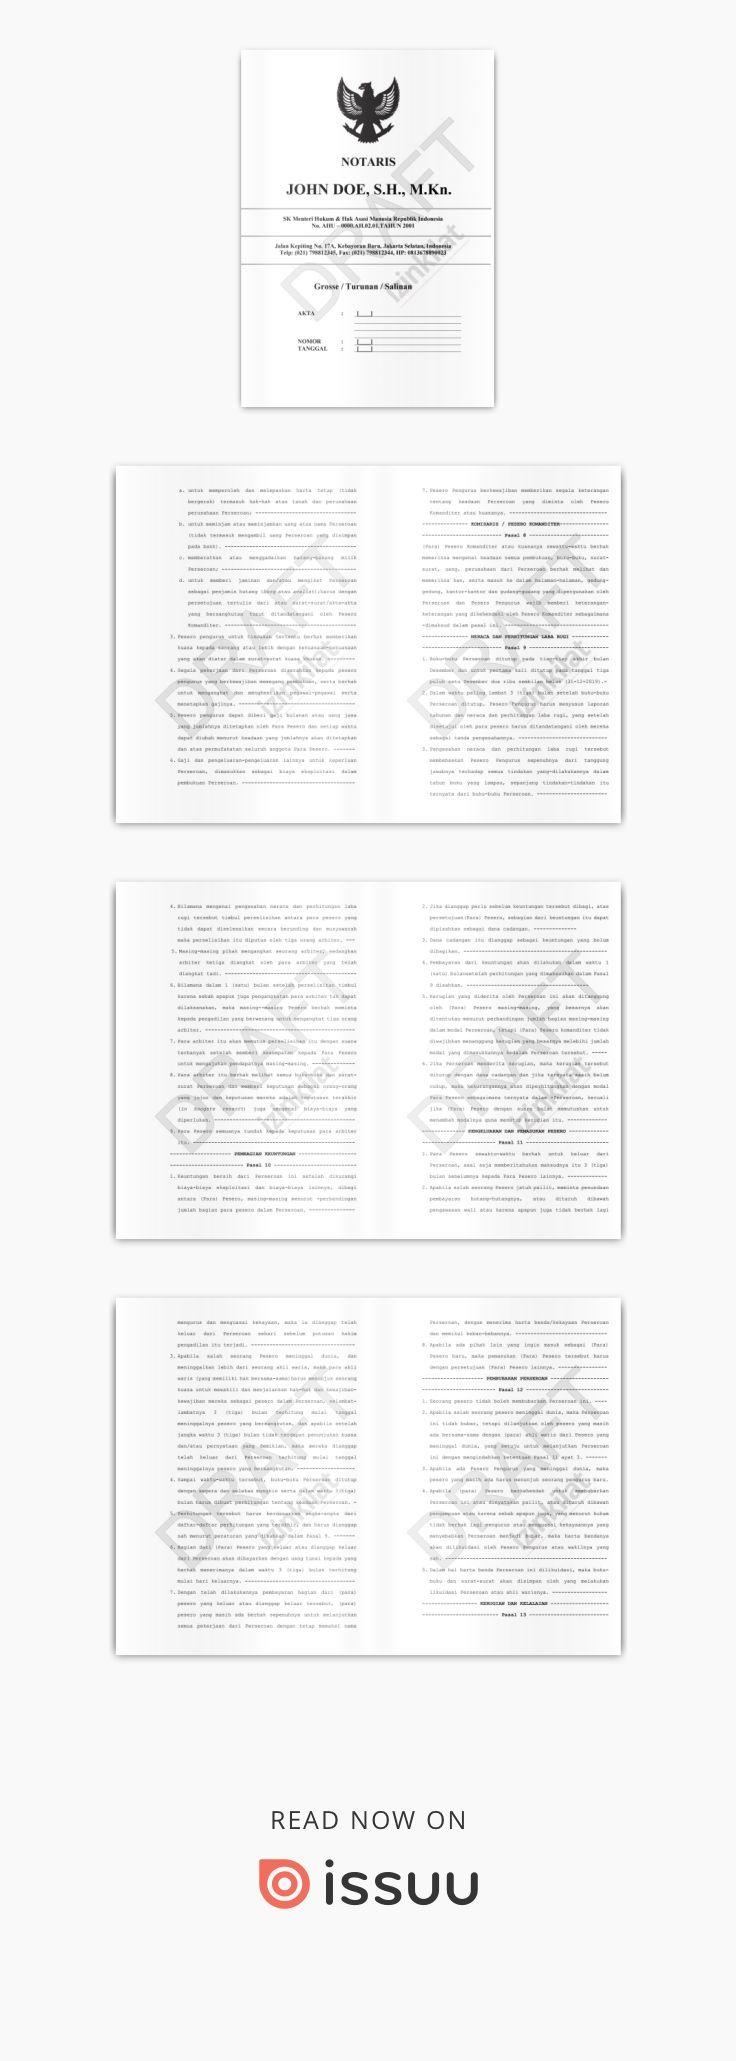 Contoh Akta Pendirian Cv Akta Notaris Cv Template Akta Cv Template Buku Tanggal